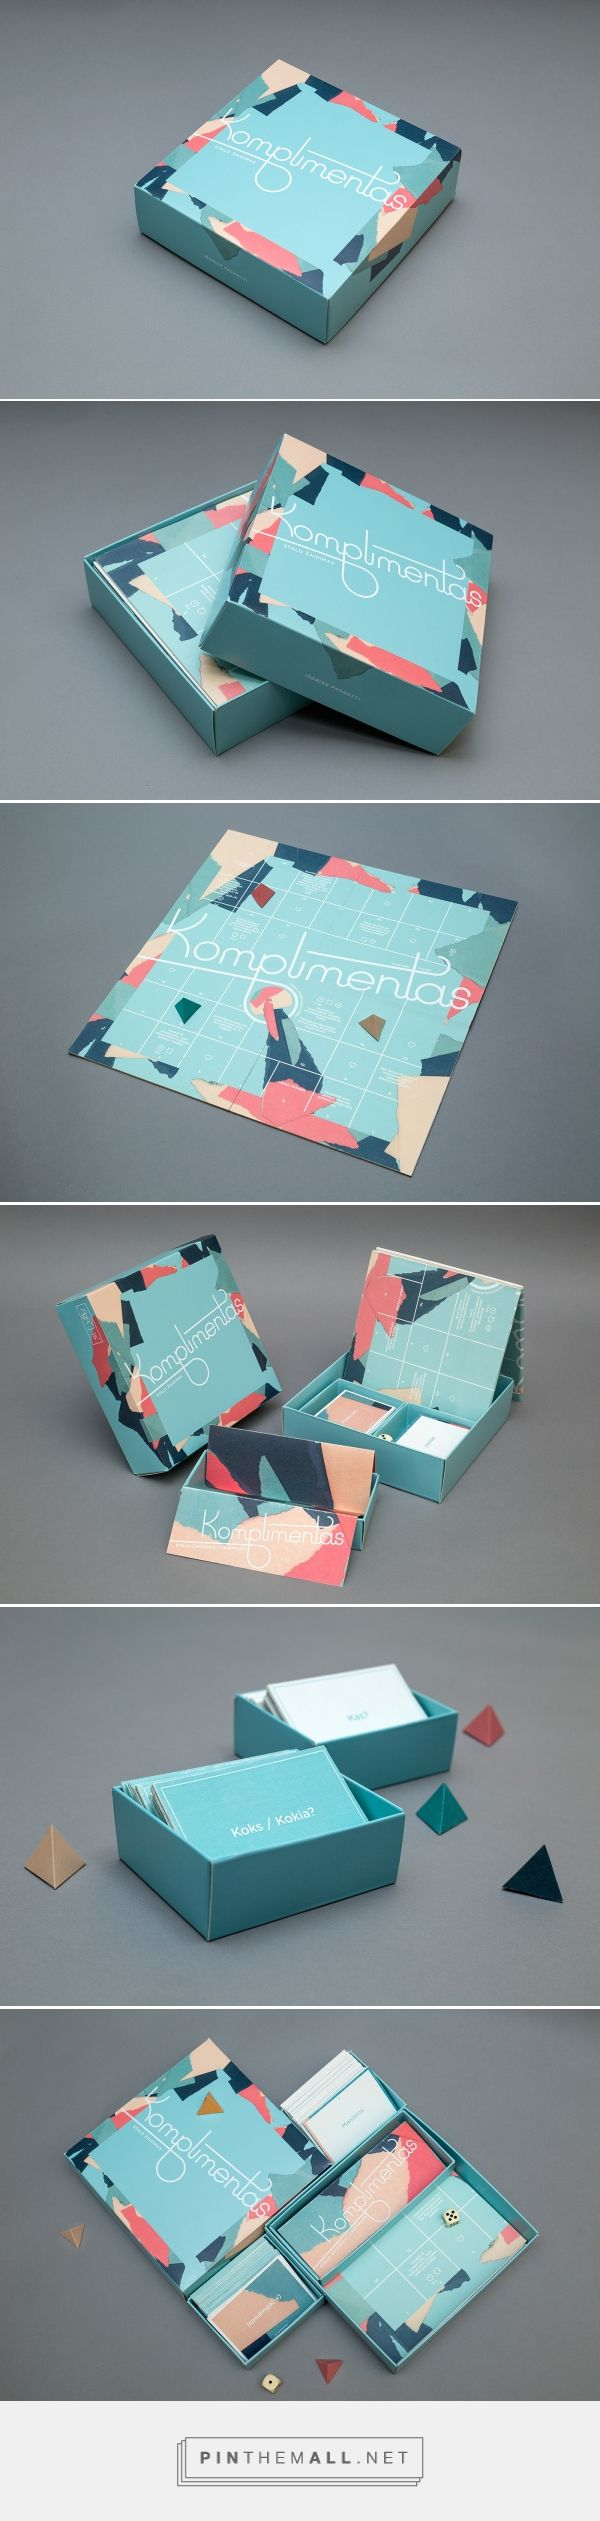 Komplimentas / board game by Regina Stonytė